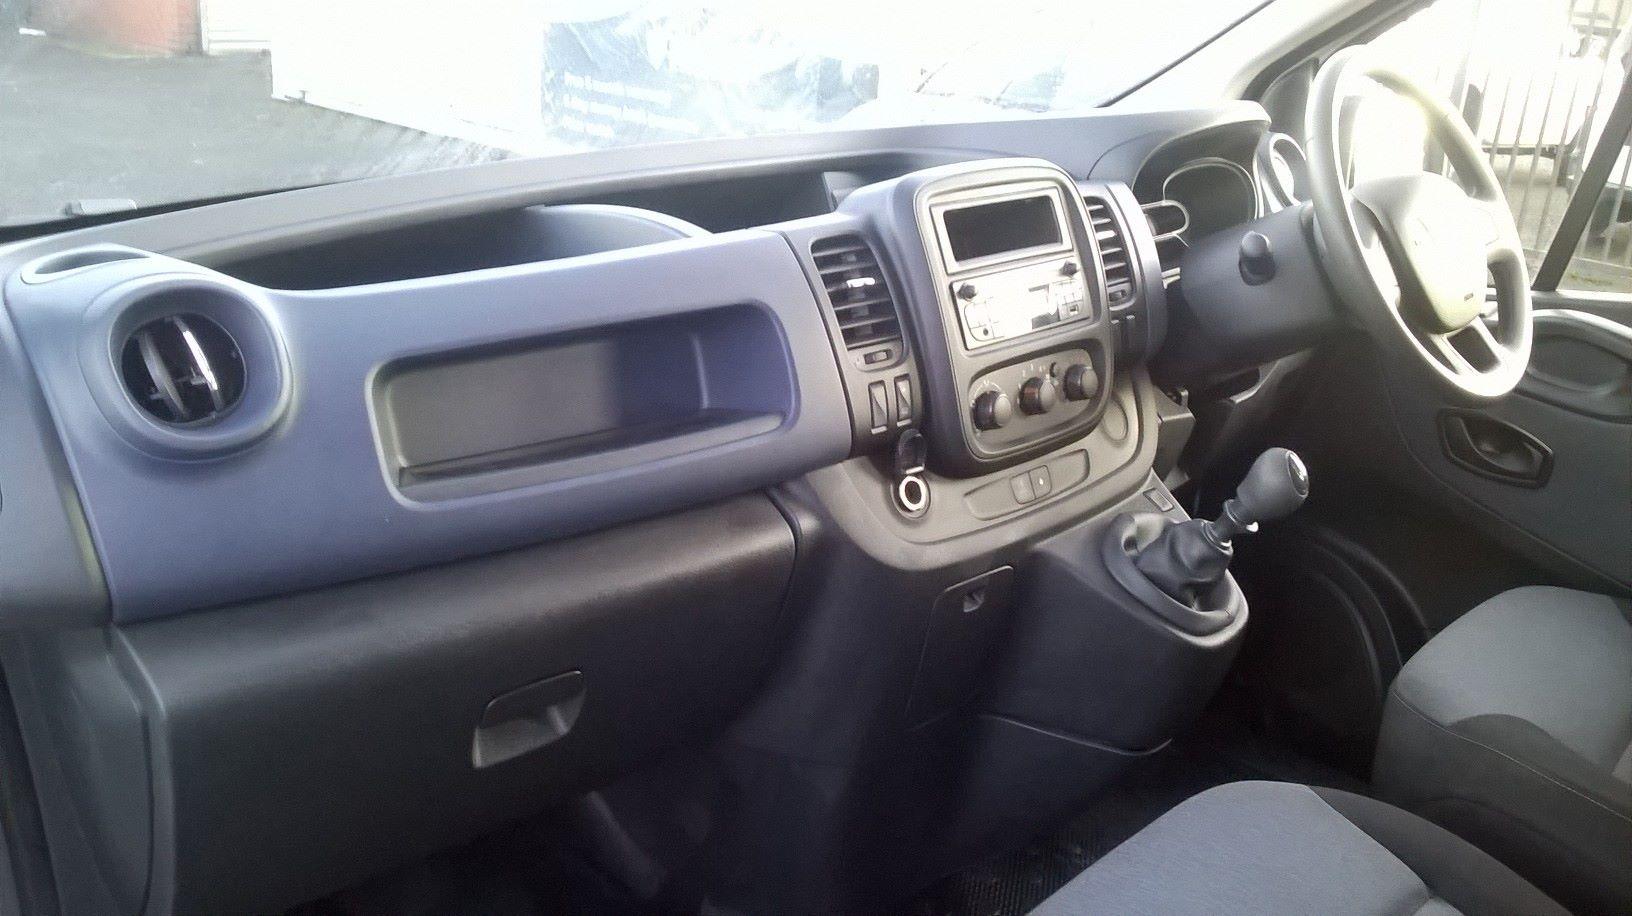 2017 Vauxhall Vivaro 2900 1.6CDTI 120Ps H1 D/CAB EURO 6 (DY67DTV) Image 15